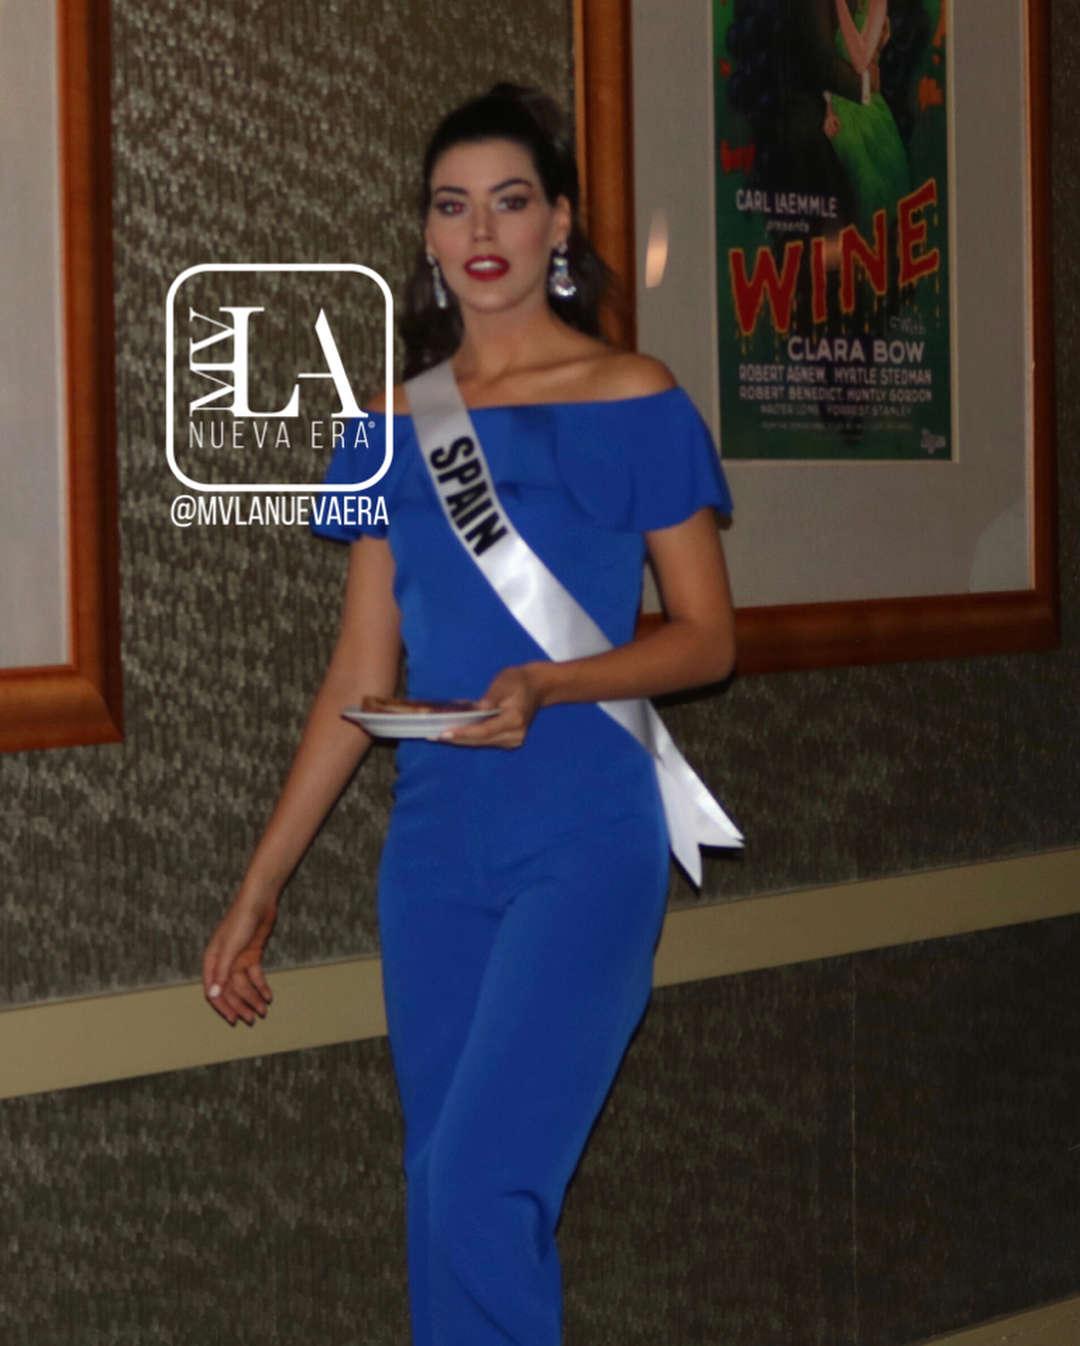 sofia del prado, top 10 de miss universe 2017/reyna hispanoamericana 2015/miss charm spain 2021. - Página 12 23967412